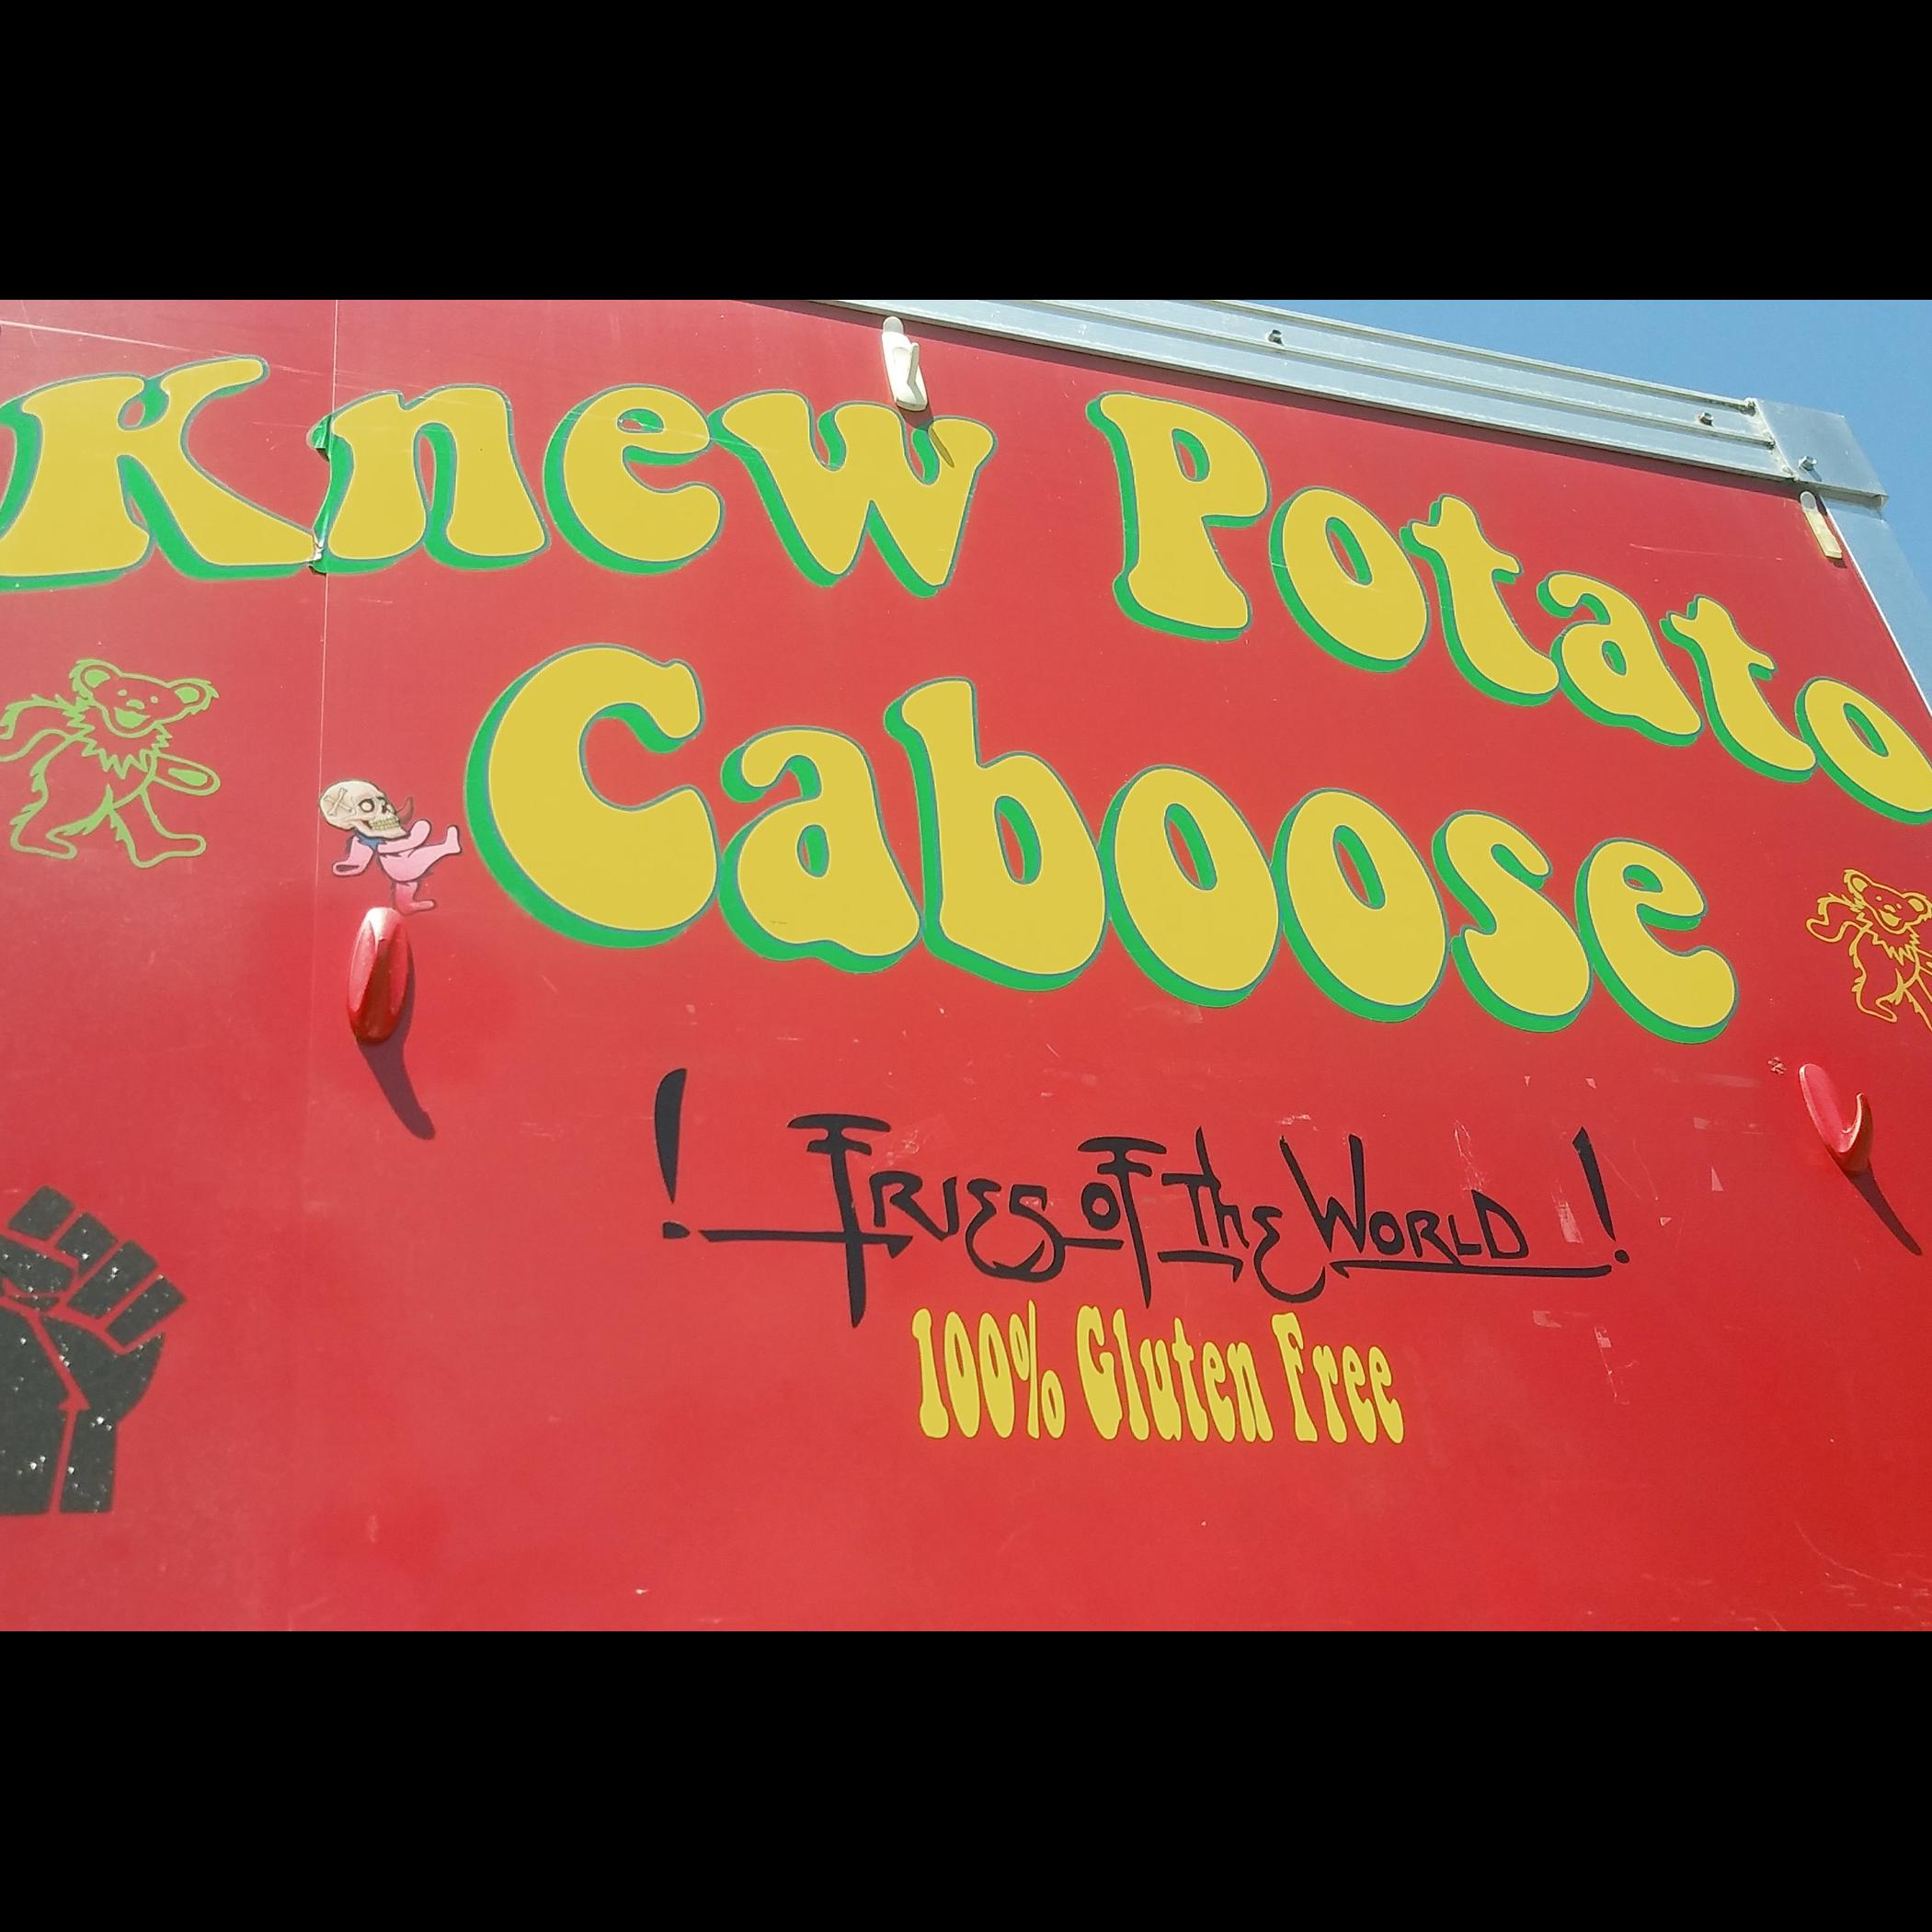 Knew Potato caboose logo